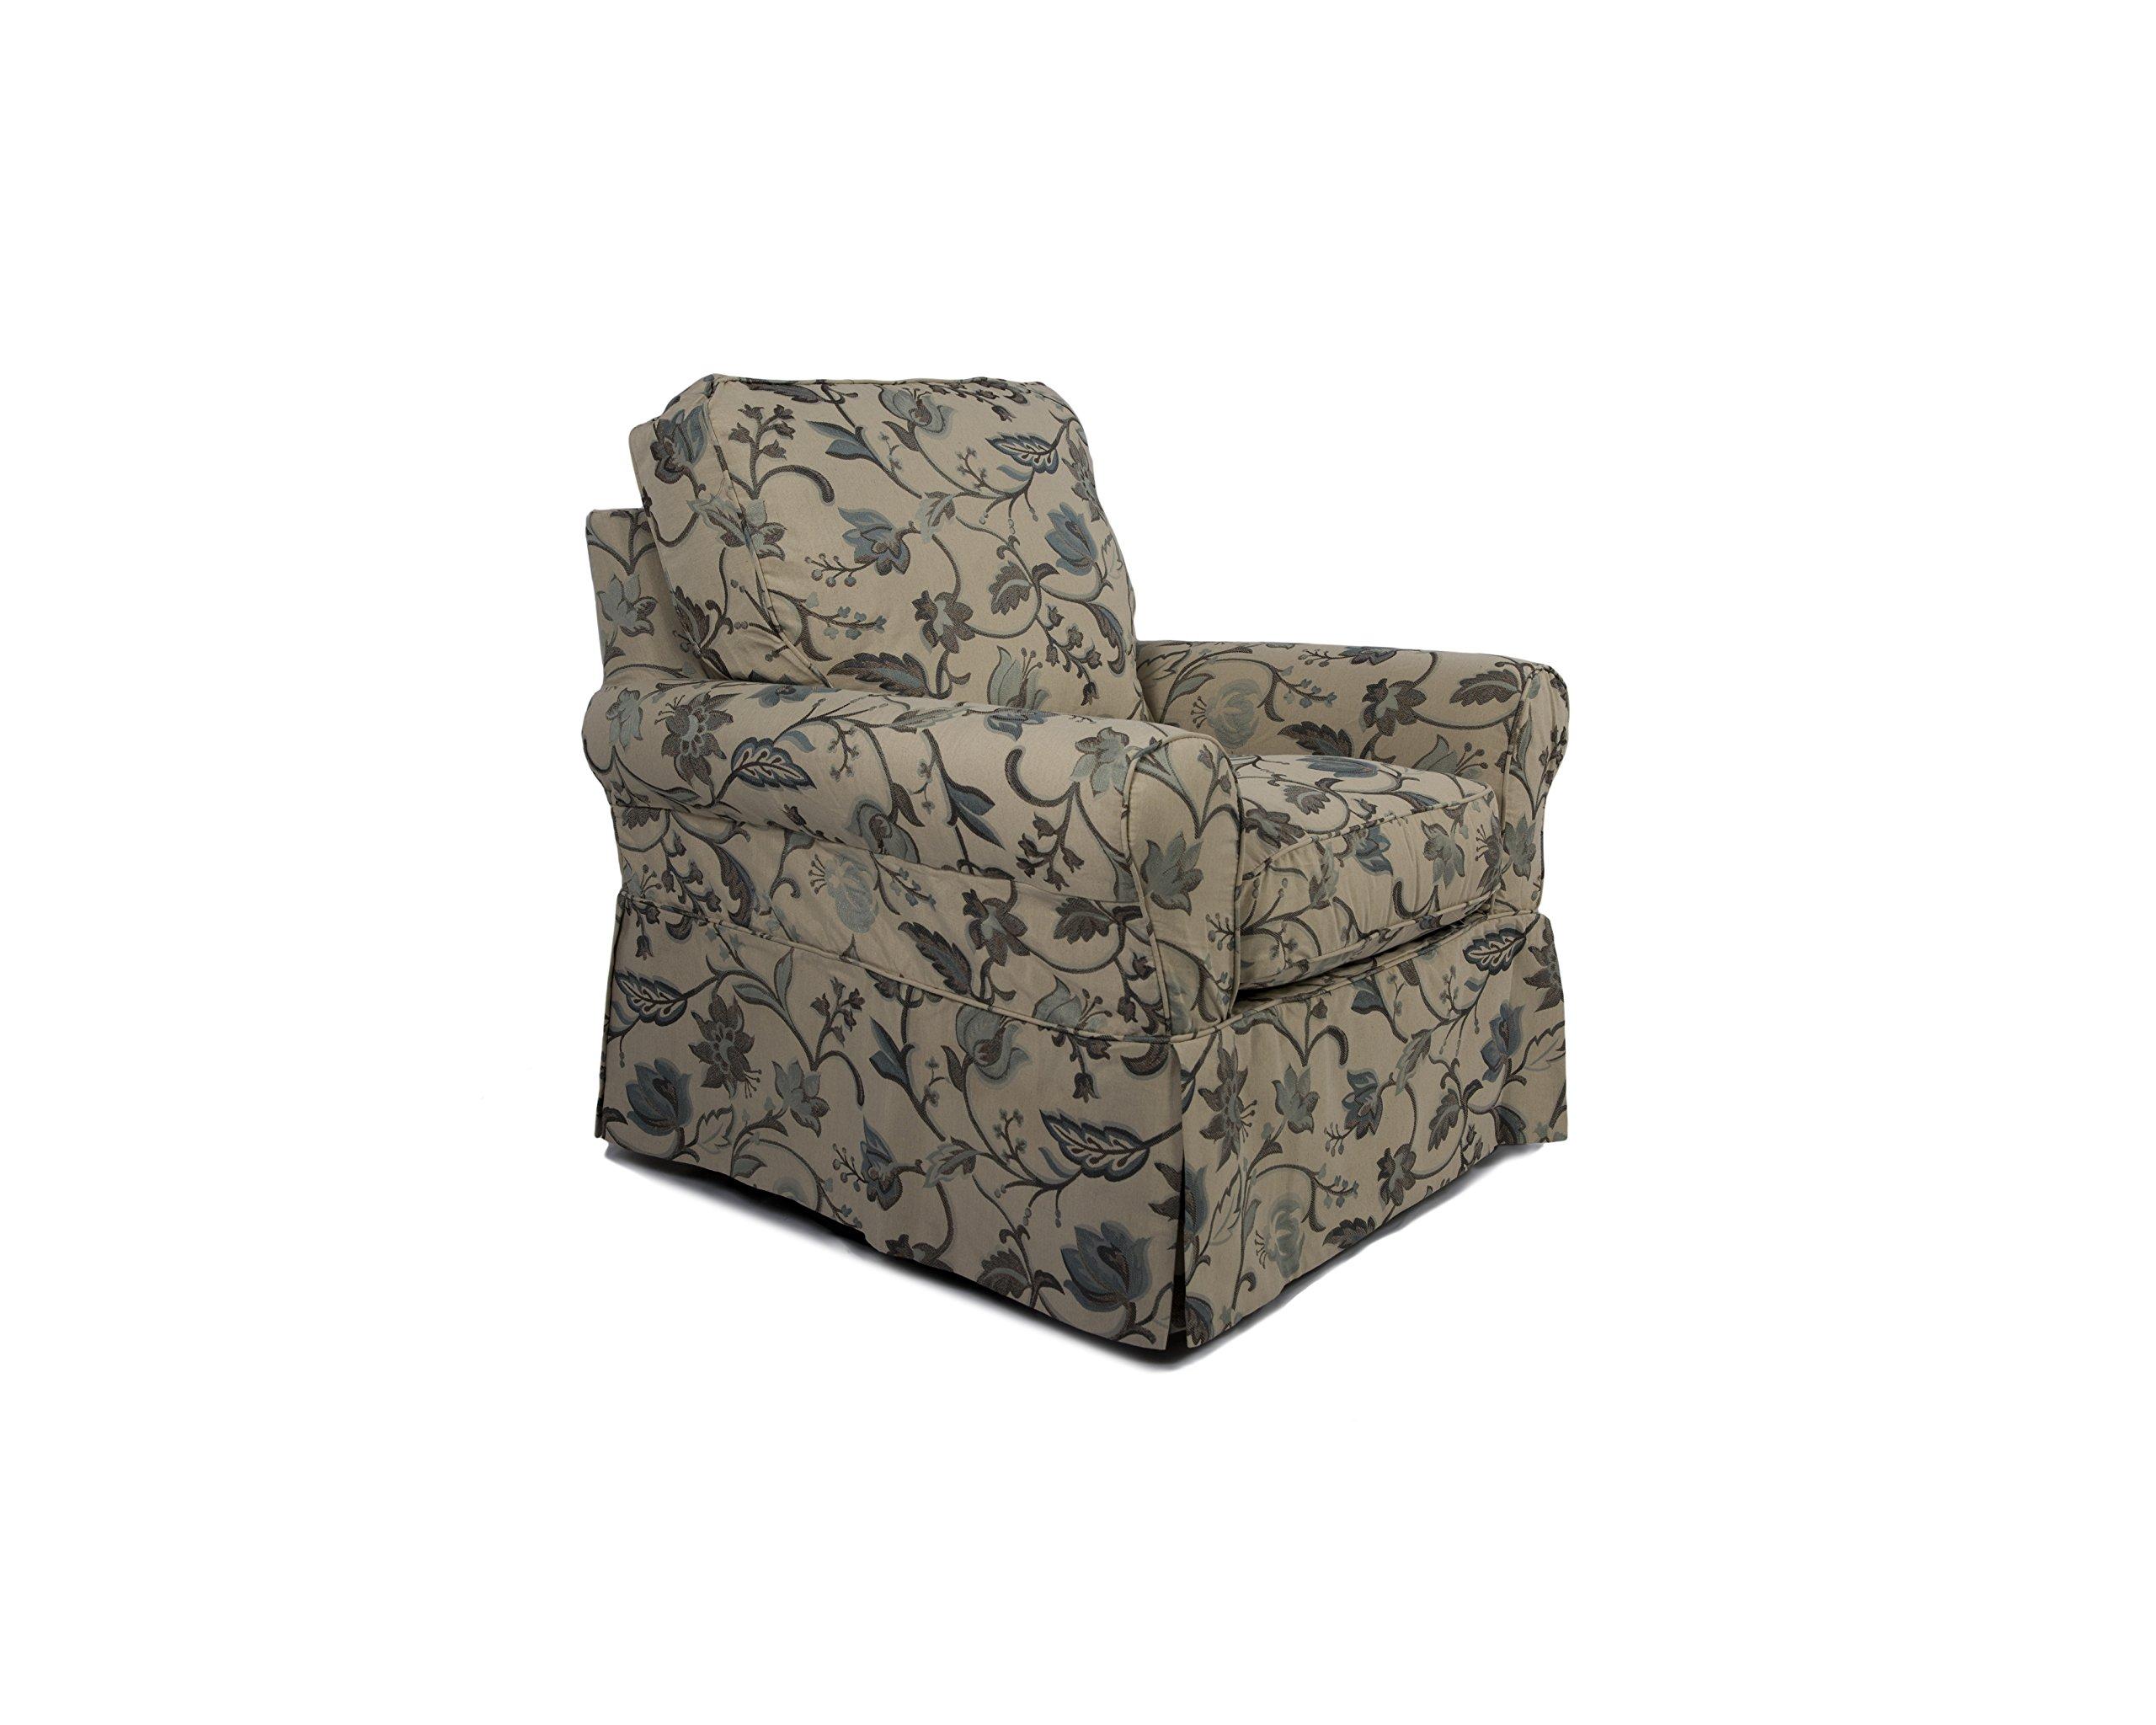 Sunset Trading Horizon Swivel Chair Slip Cover Set Only, Saratoga Spa